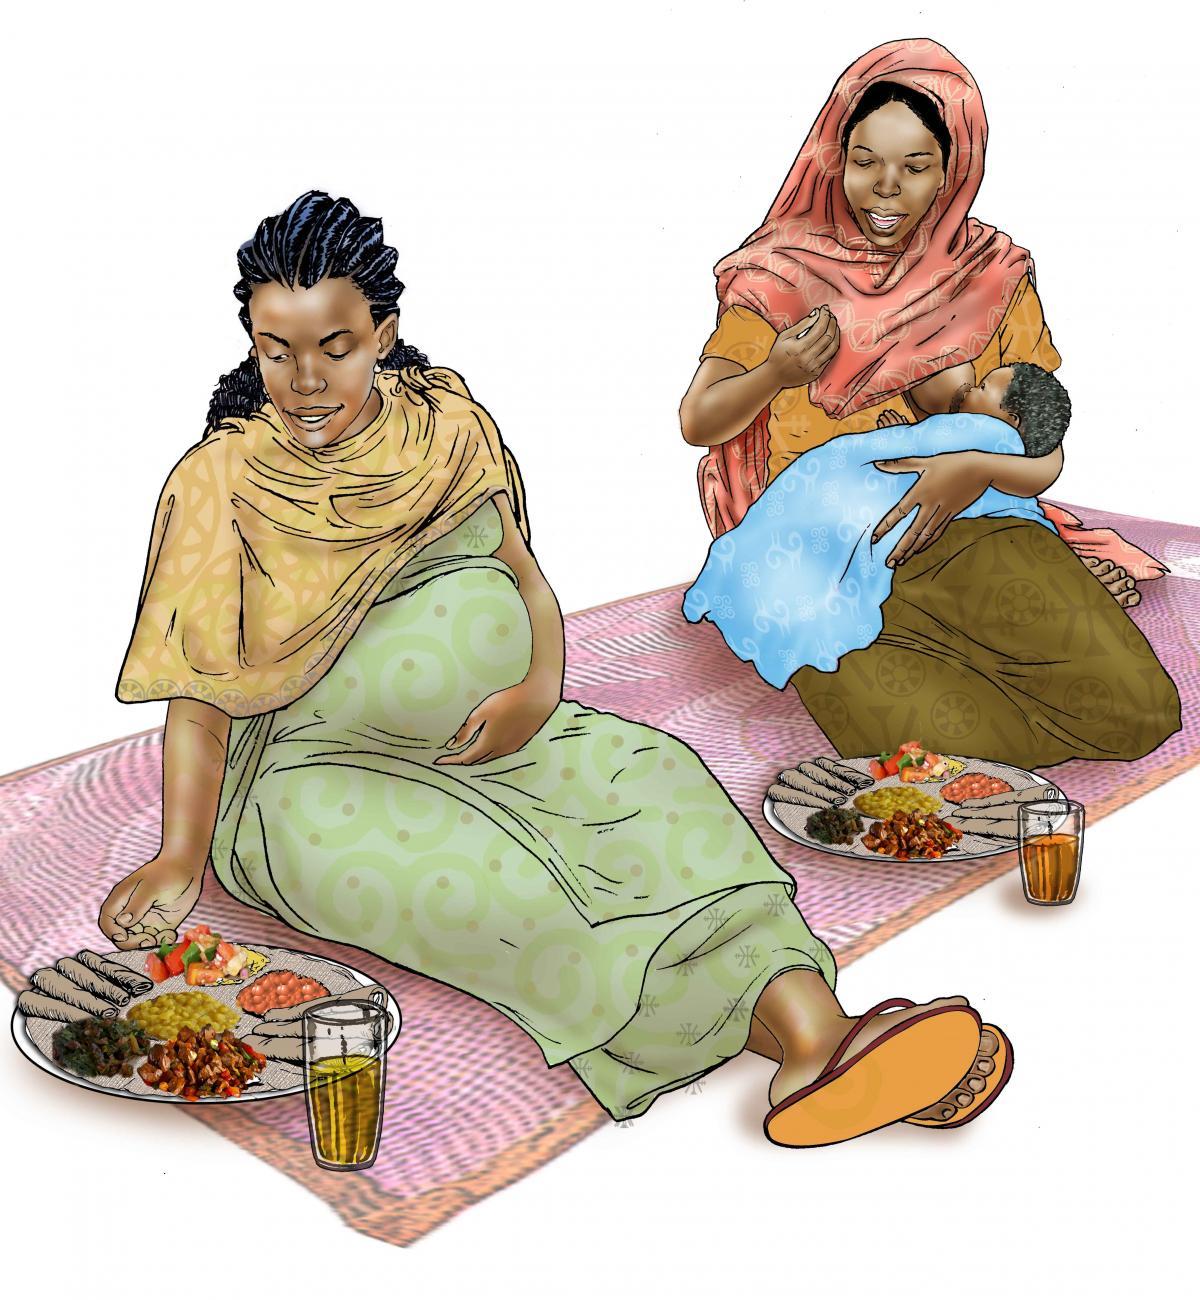 Breastfeeding - Mothers eating healthy meals - 05 - Ethiopia